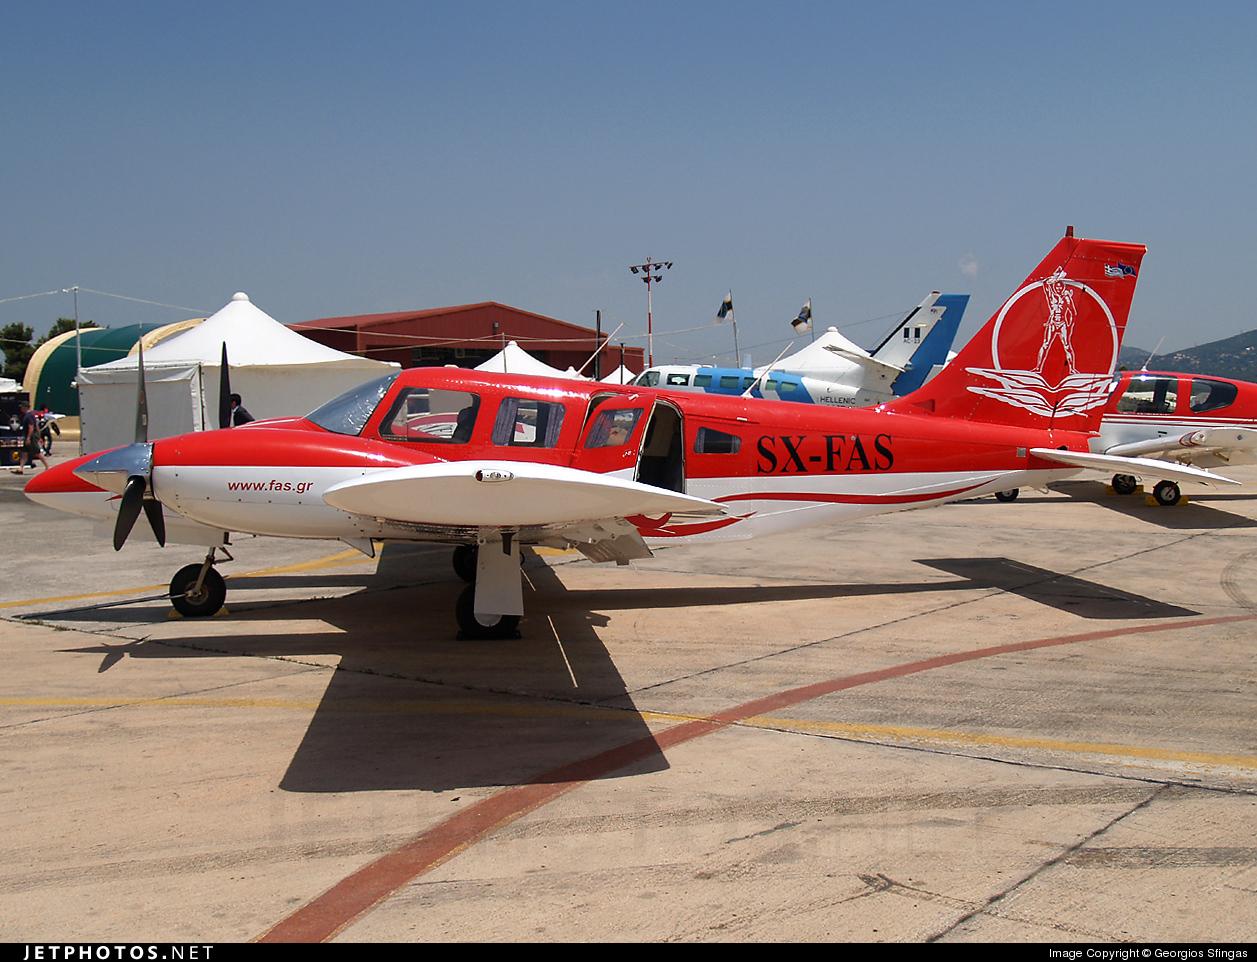 SX-FAS - Piper PA-34-200T Seneca II - FAS - Rhodos Pilots Academy